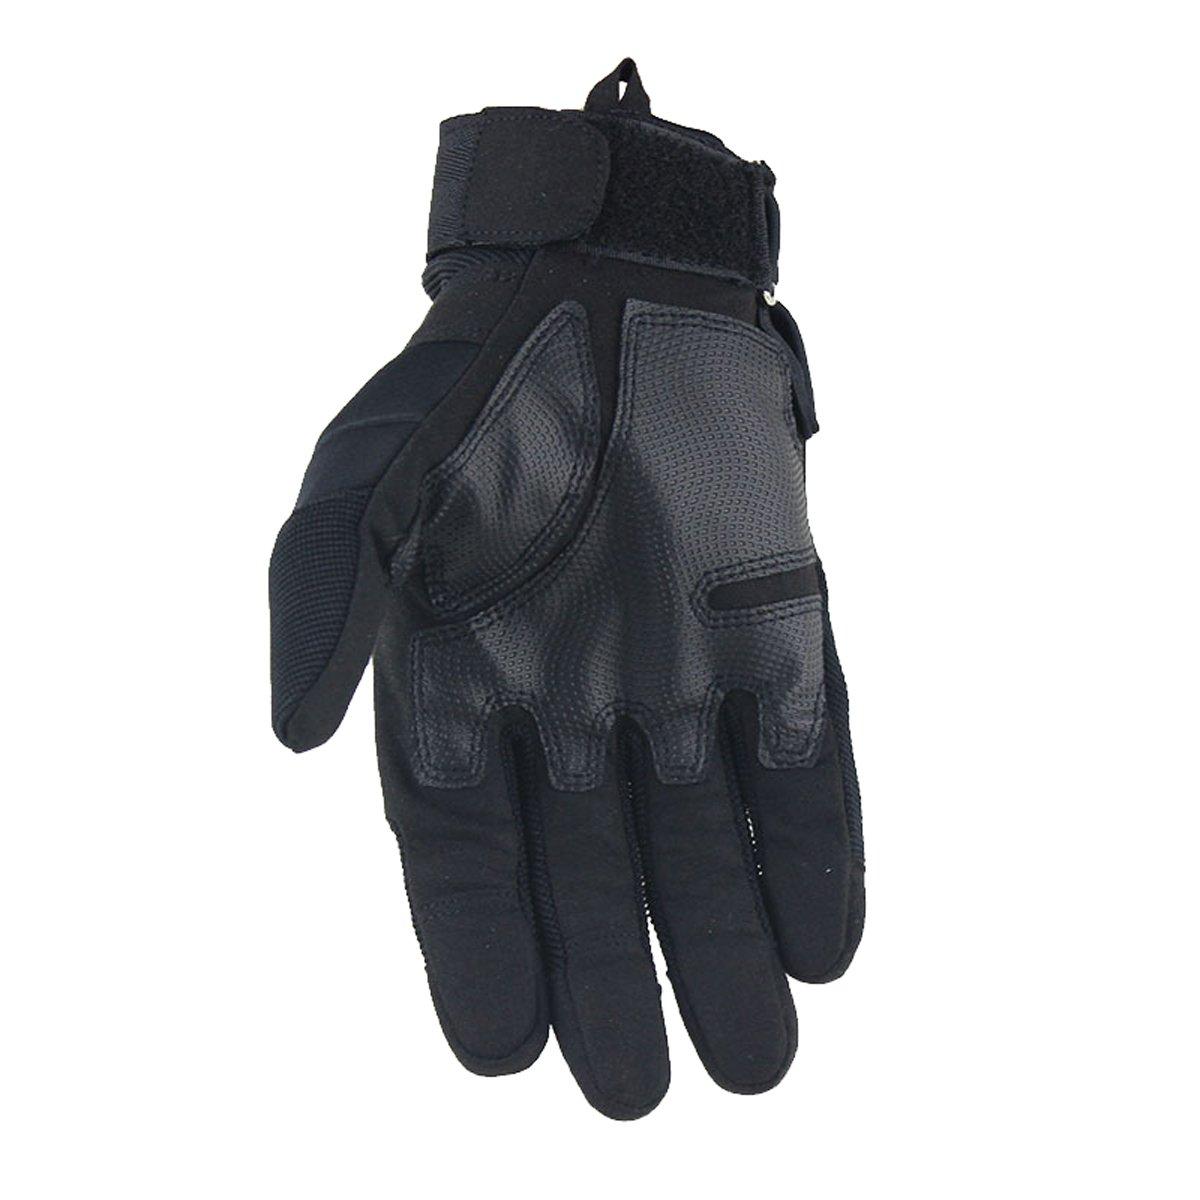 Fingerless impact gloves - Amazon Com Mens Tactical Gloves Hard Knuckle Full Finger Fingerless Military Gear Sports Outdoors